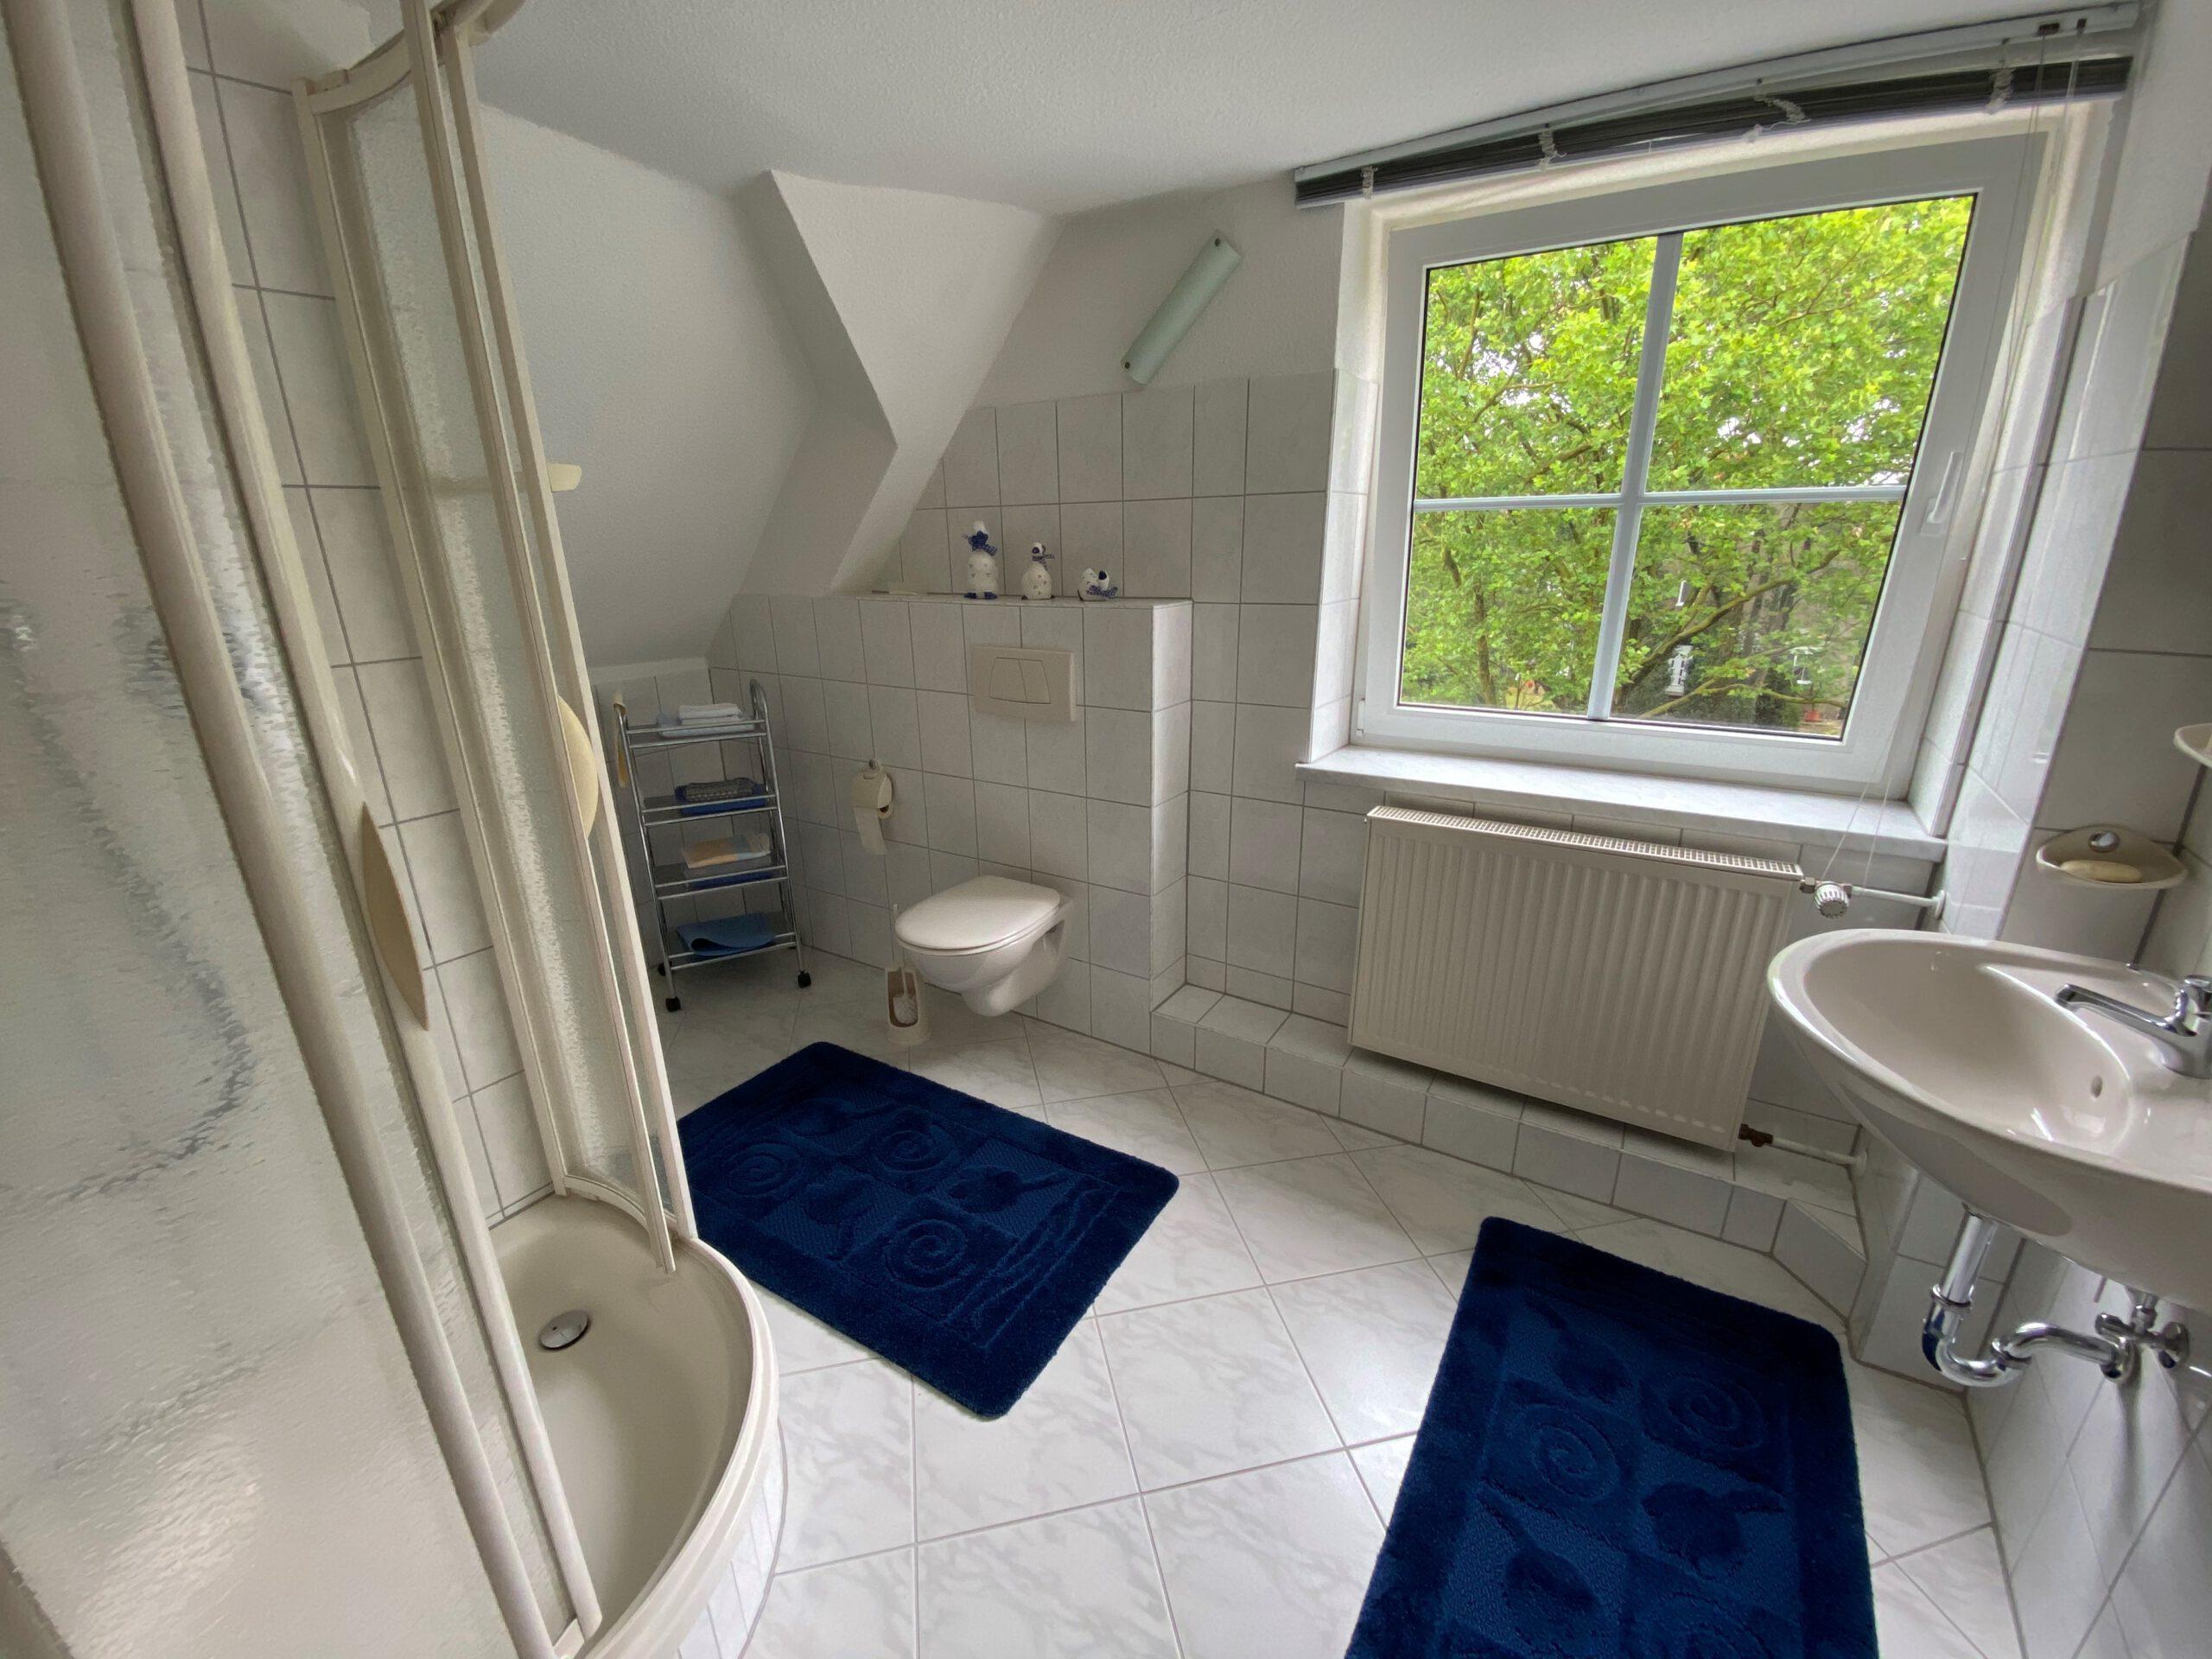 Einfamilienhaus in Leuna - Bad im Dachgeschoss